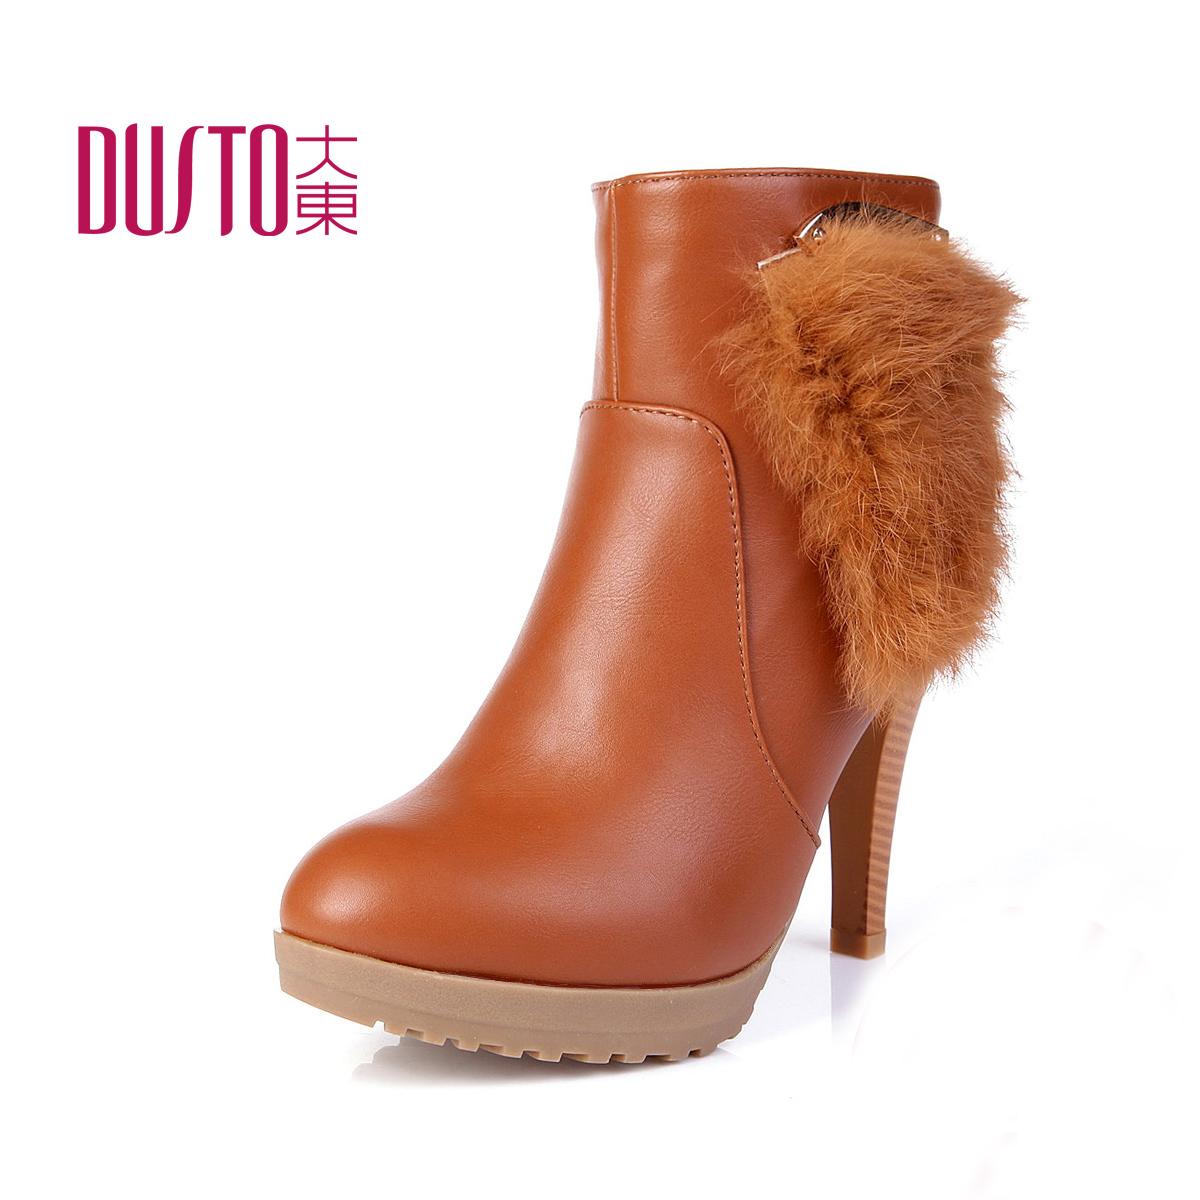 dusto/大东2013新款靴子欧美性感时装靴高跟鞋防水台细跟短靴圆头